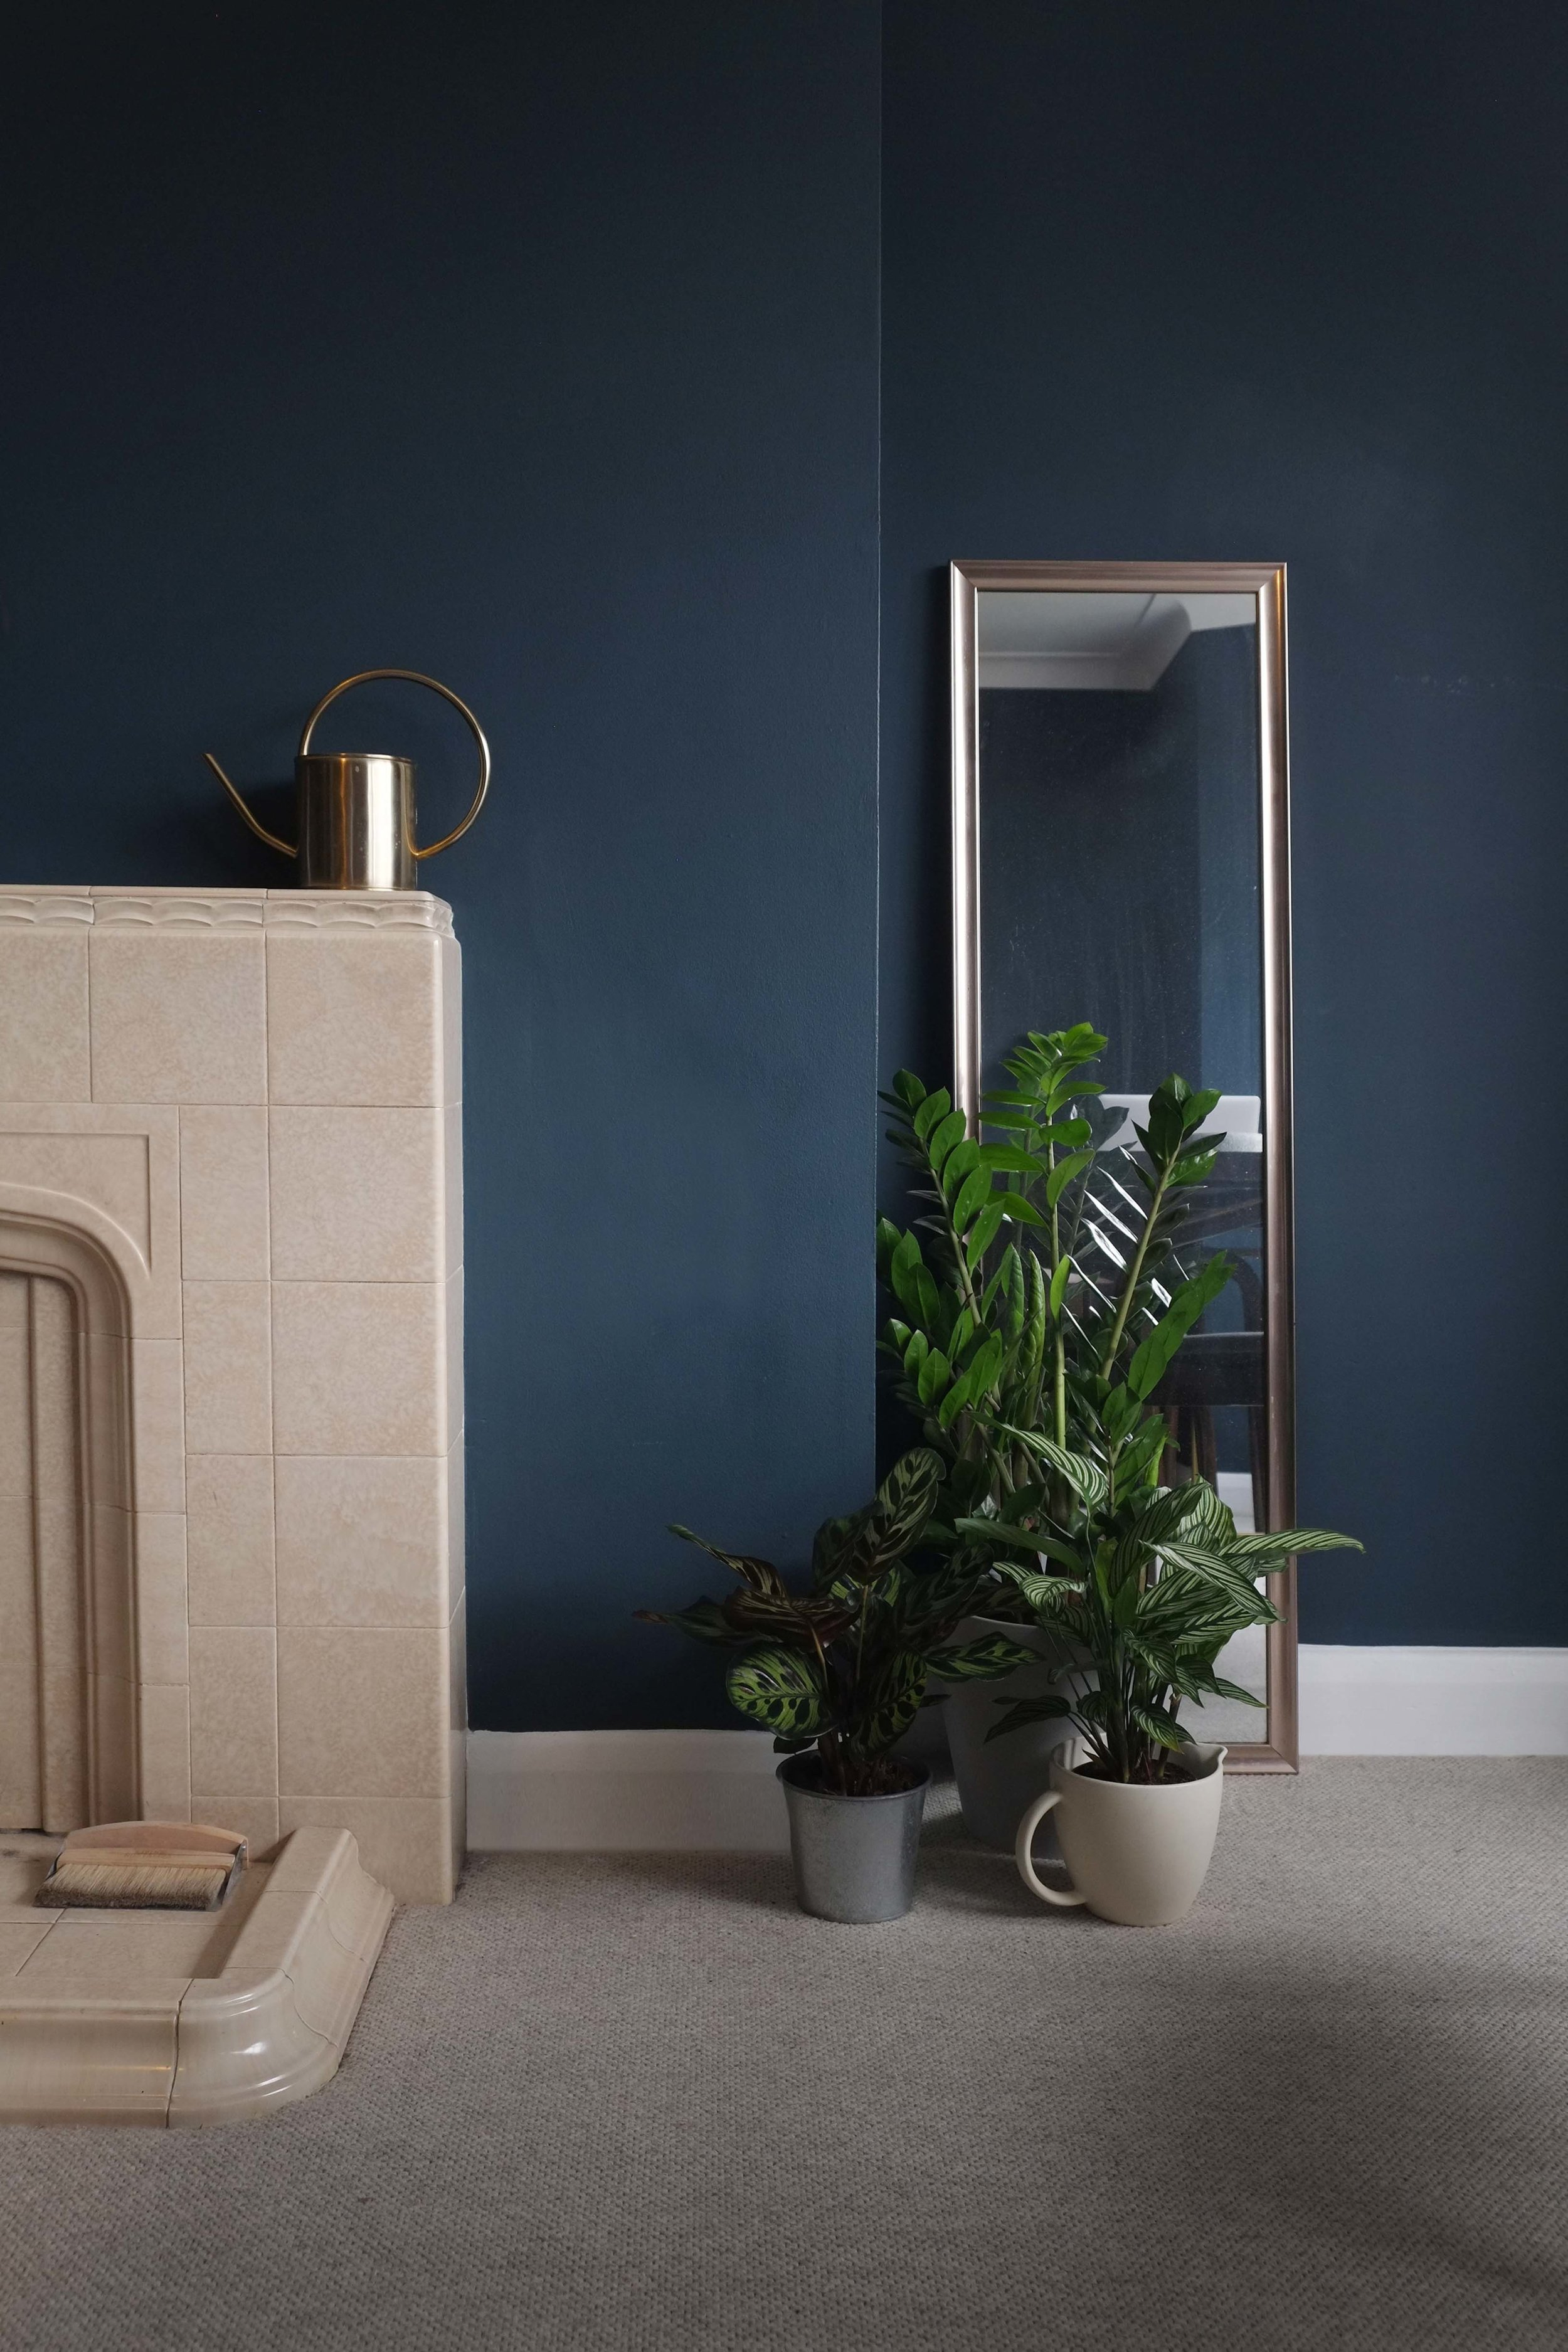 lunarlunar_interior_design_apartment_art_deco_deanhill_lounge_3.jpg